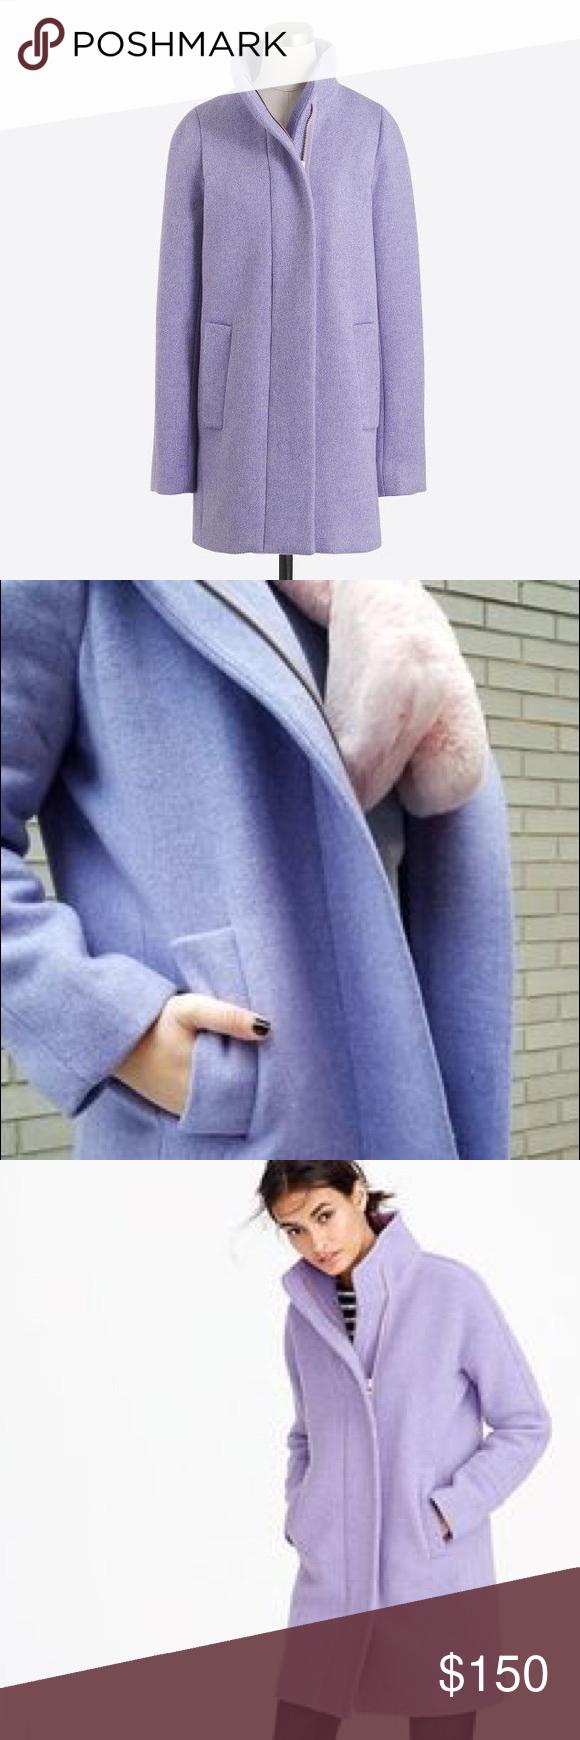 J.Crew Factory City Coat NWT Size 4 NWT